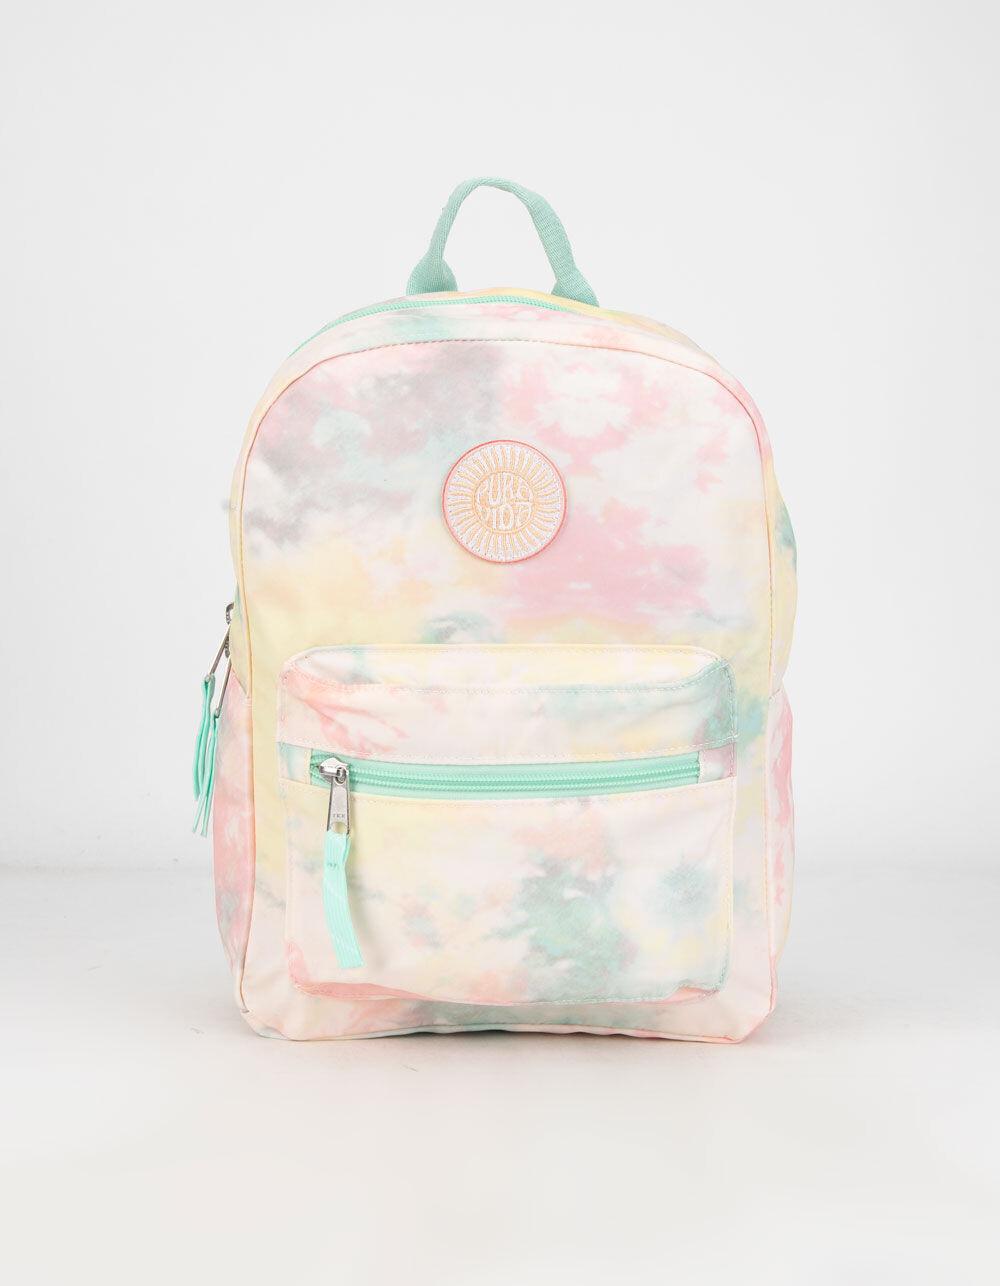 Pura Vida Backpack Mini TIE DYE